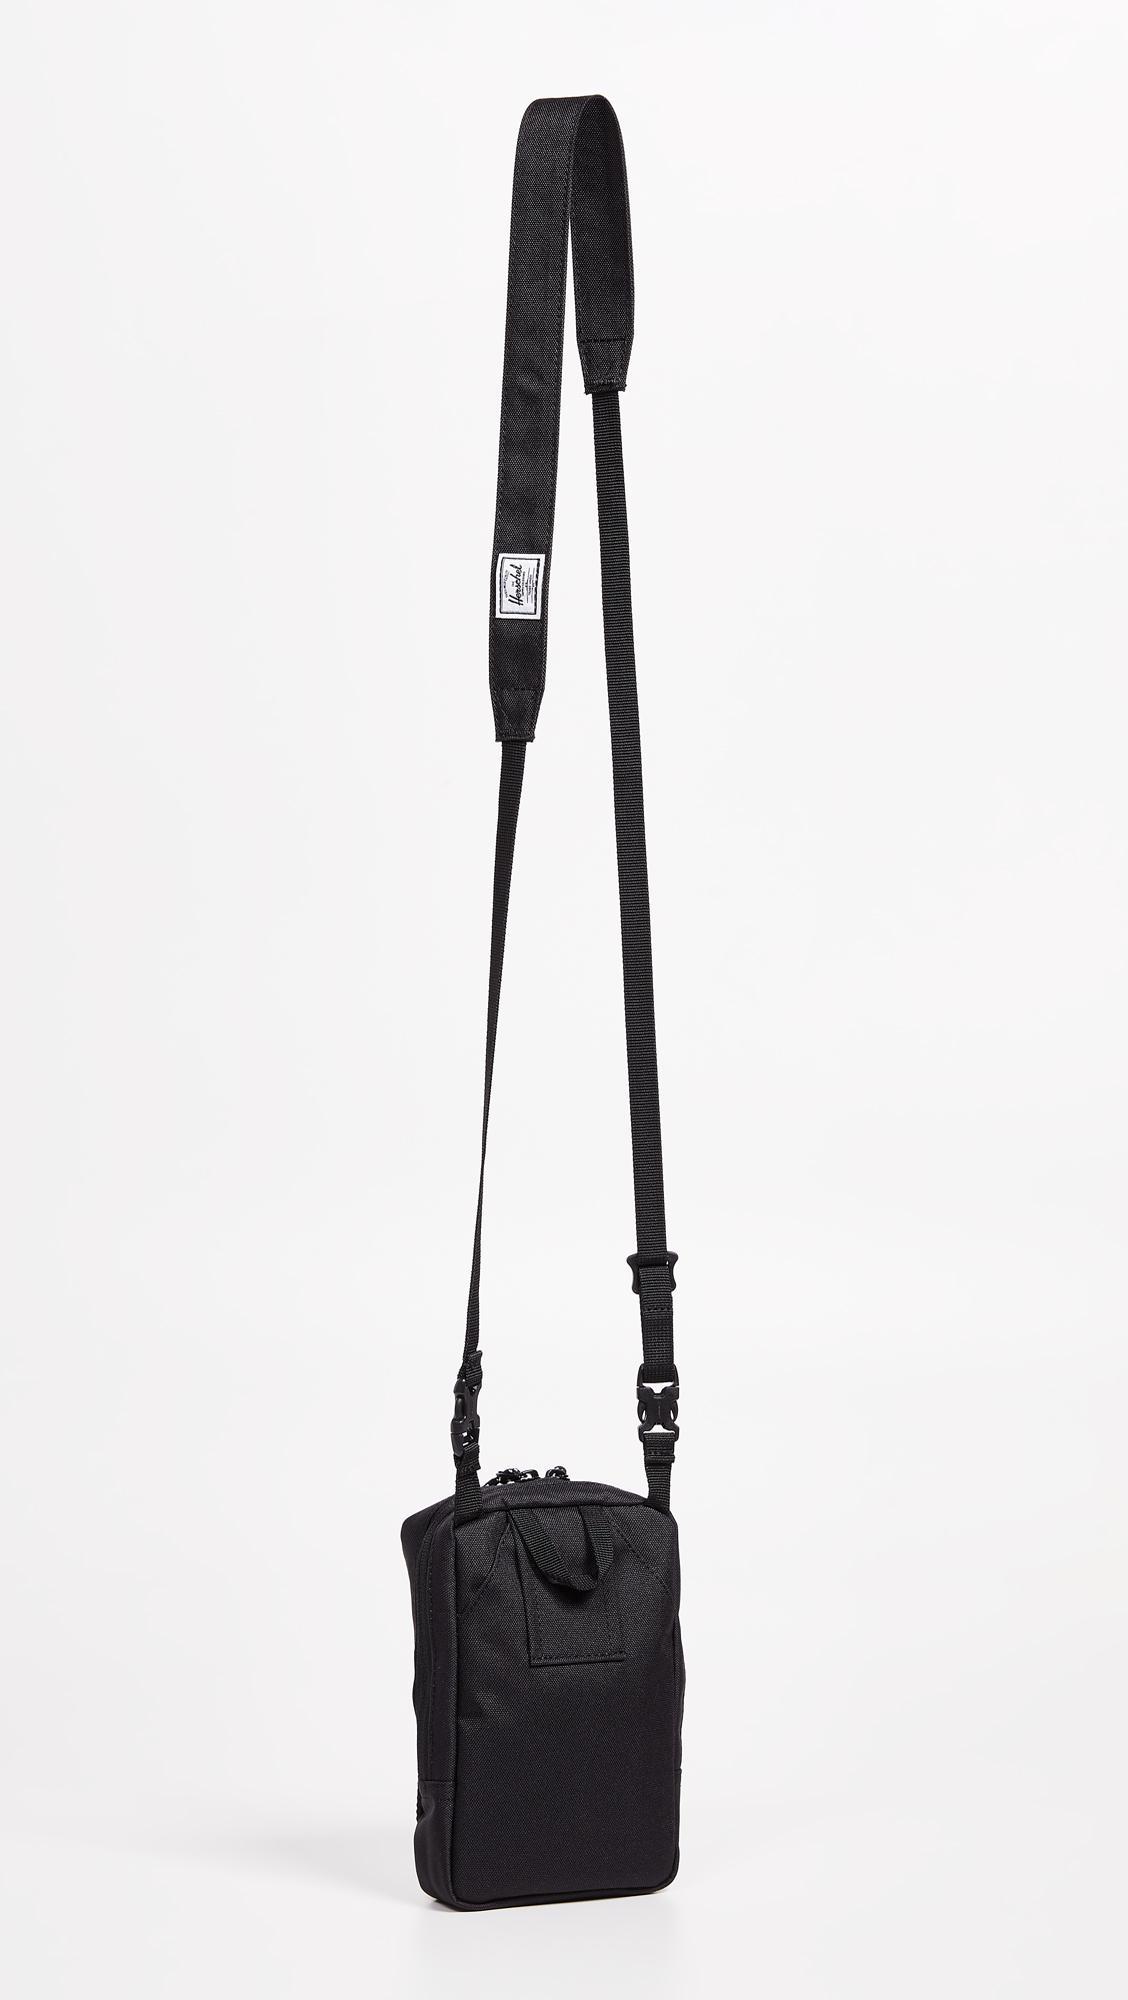 326e6552013 Lyst - Herschel Supply Co. Sinclair Bag in Black for Men - Save 17%